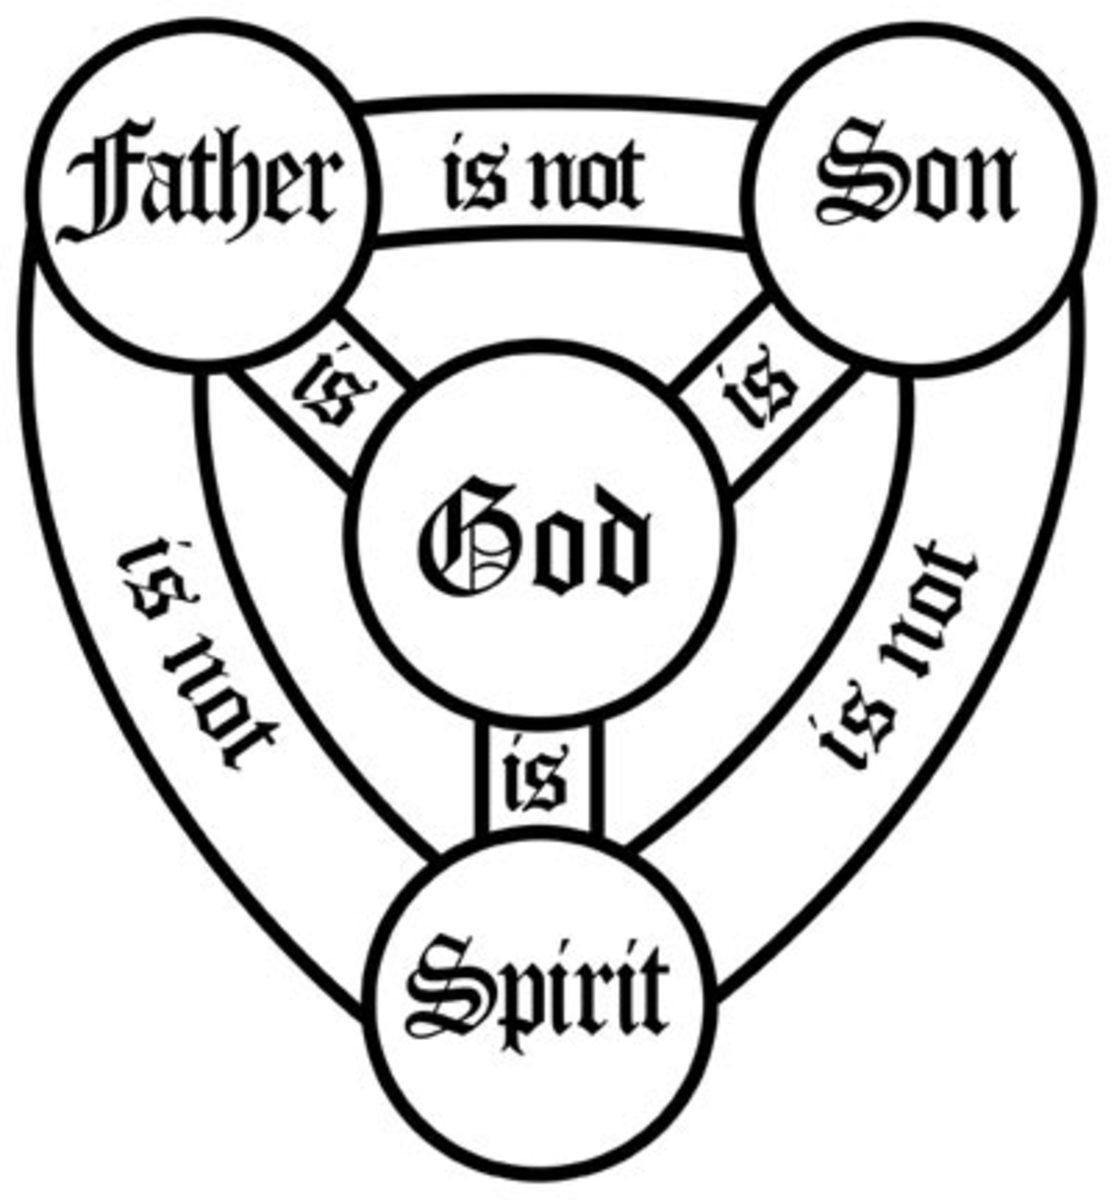 A visual representation of the extremely brief summation of the Athanasian Creed